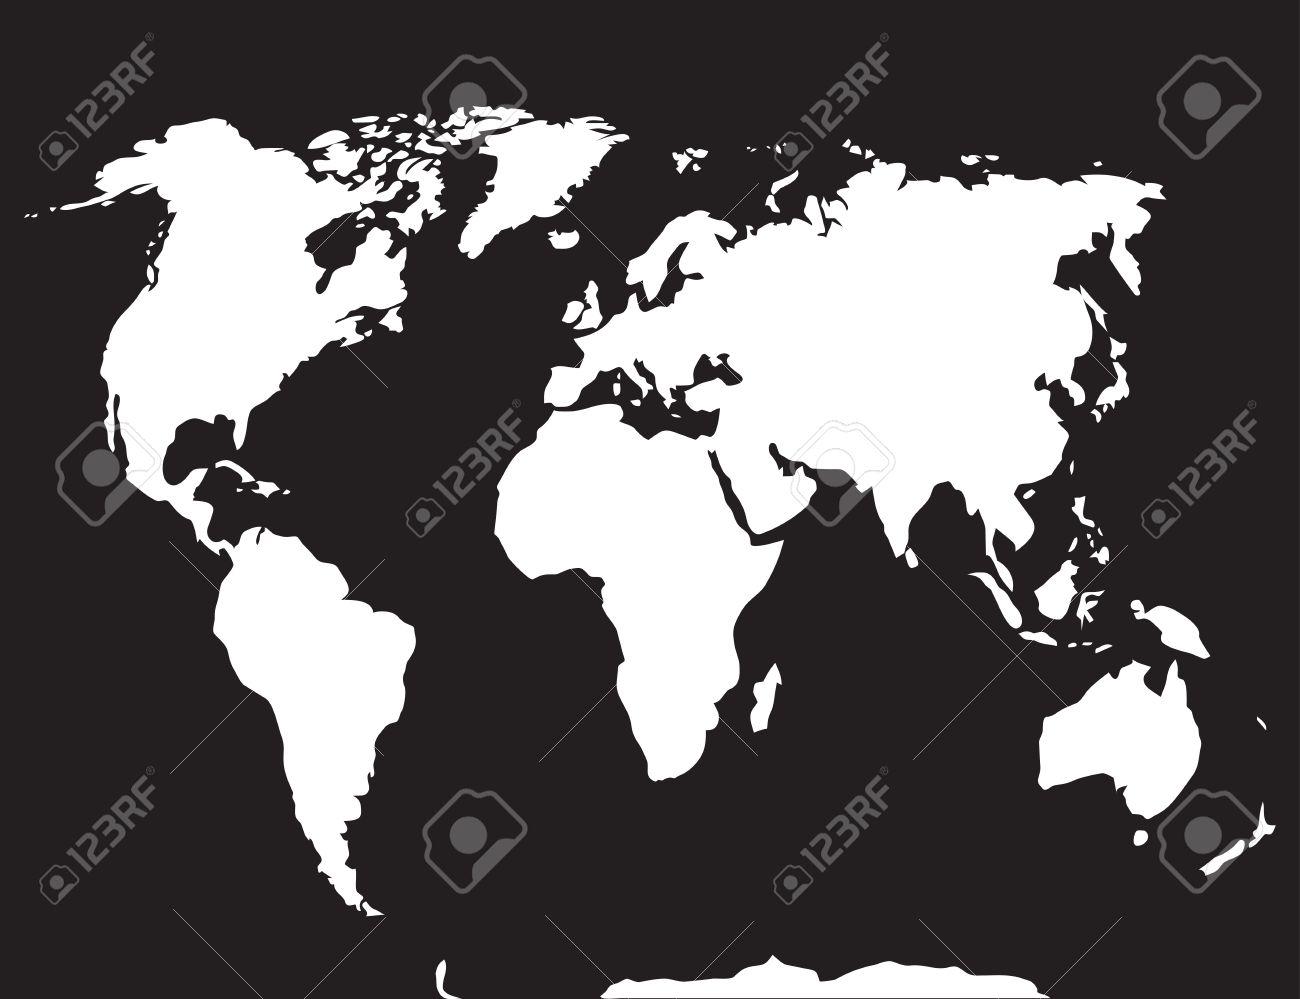 Karte Europa Schwarz Weiss.Stock Photo